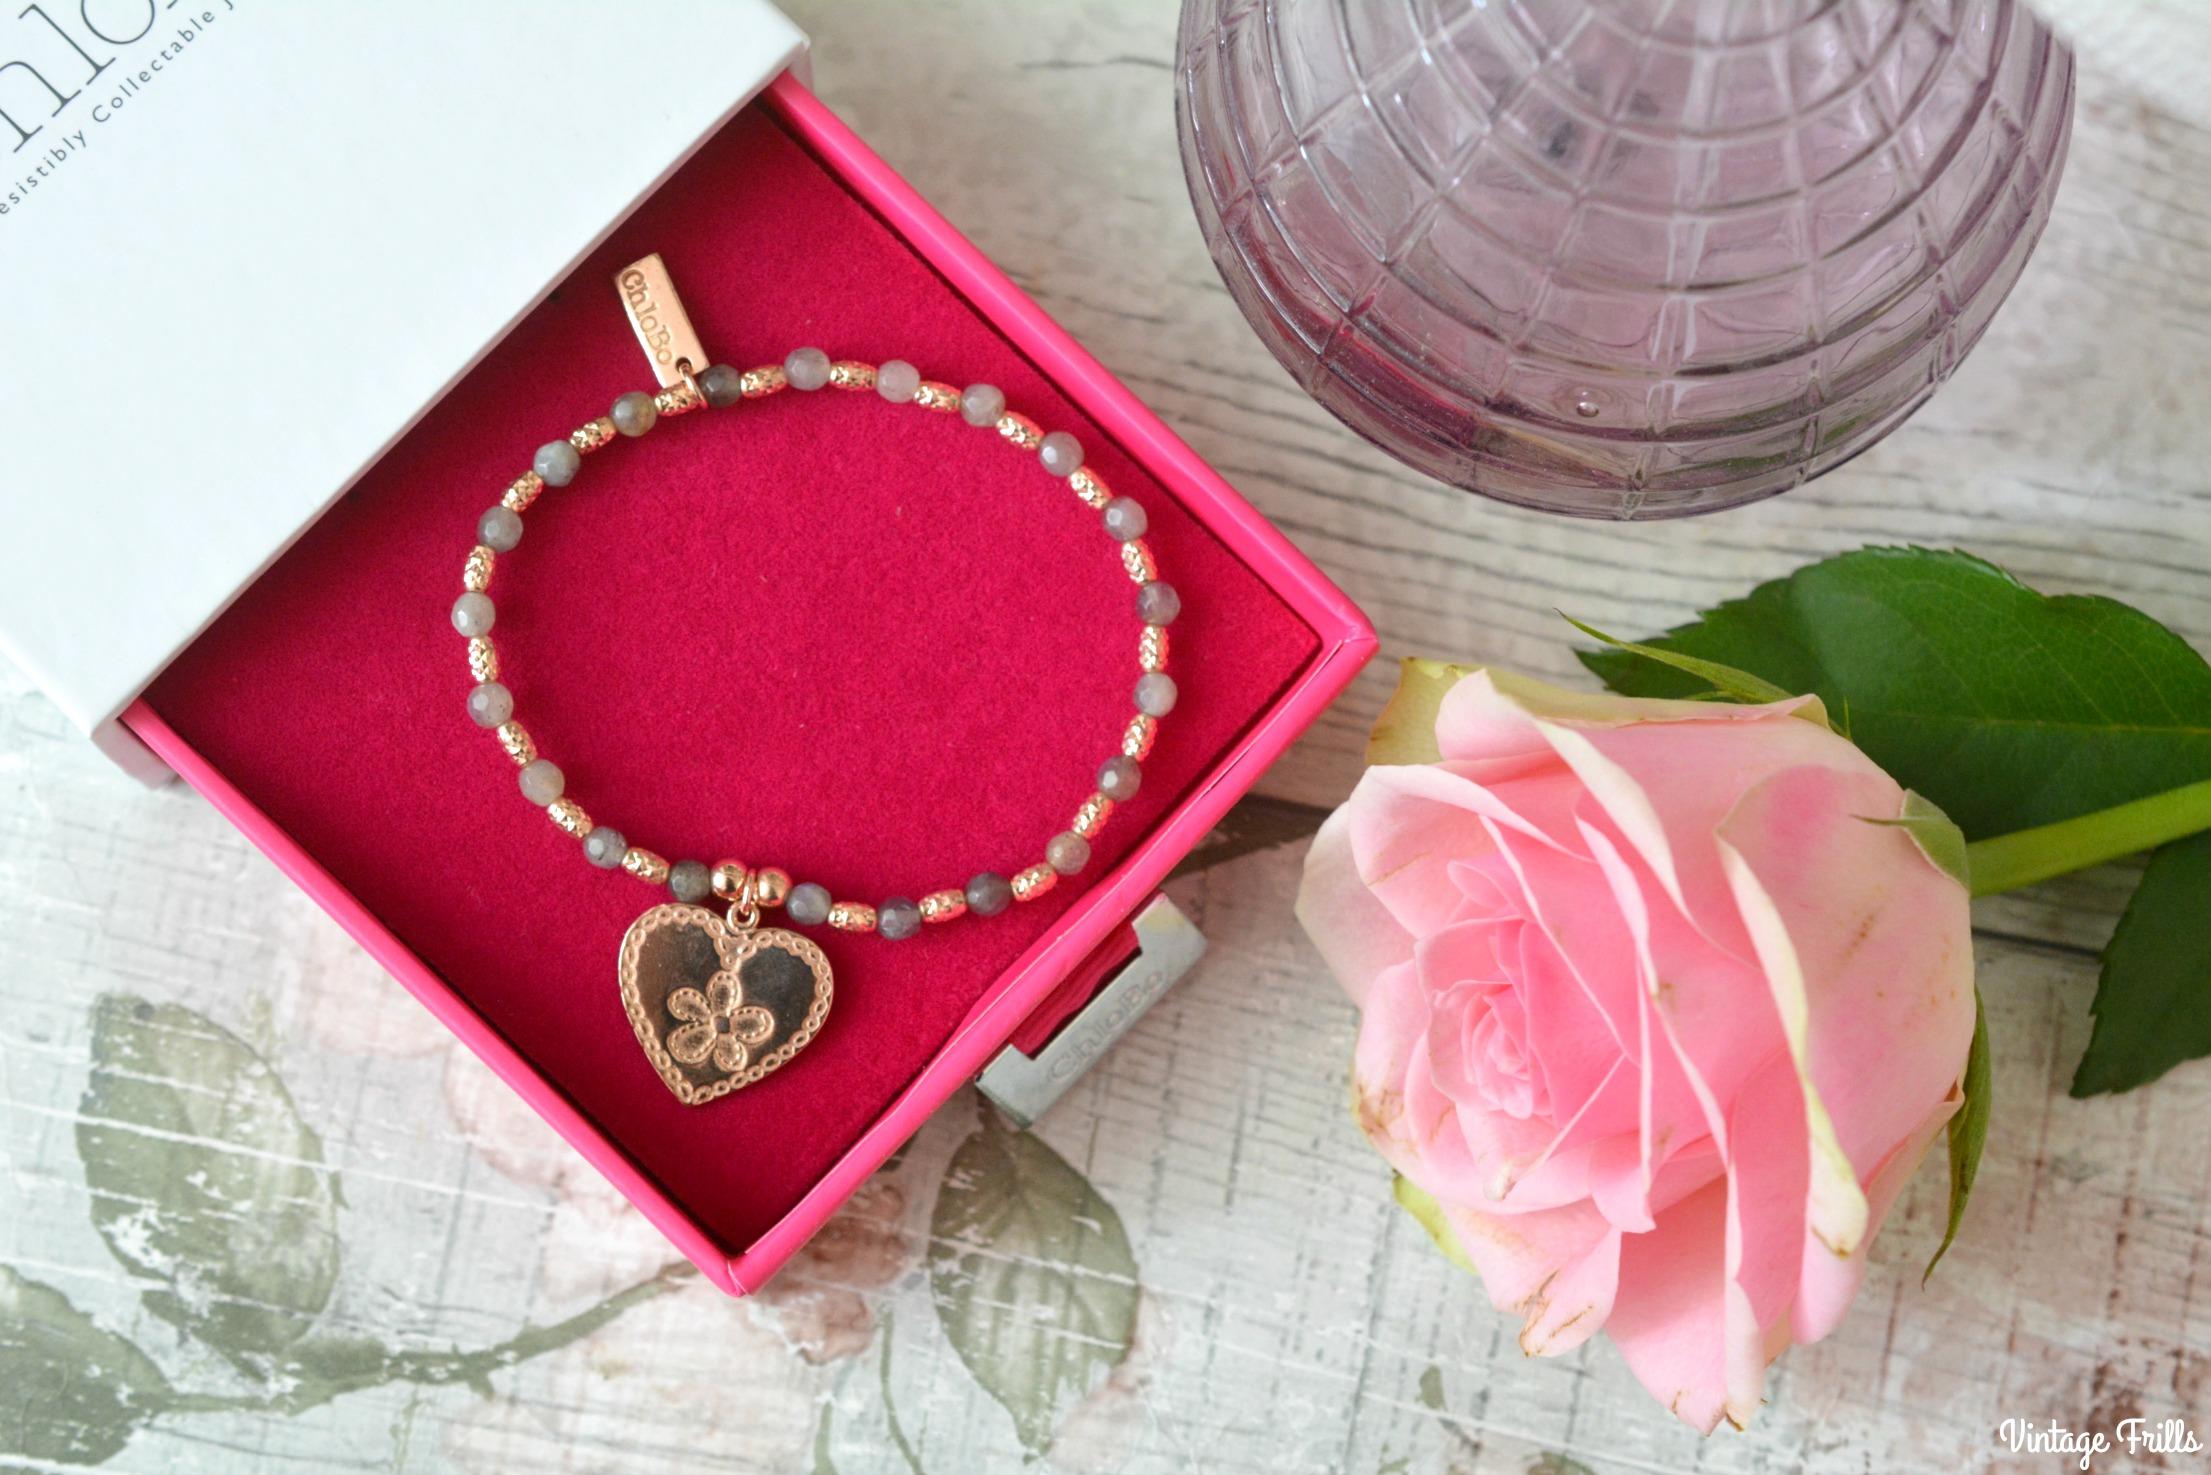 A Charming New Bracelet